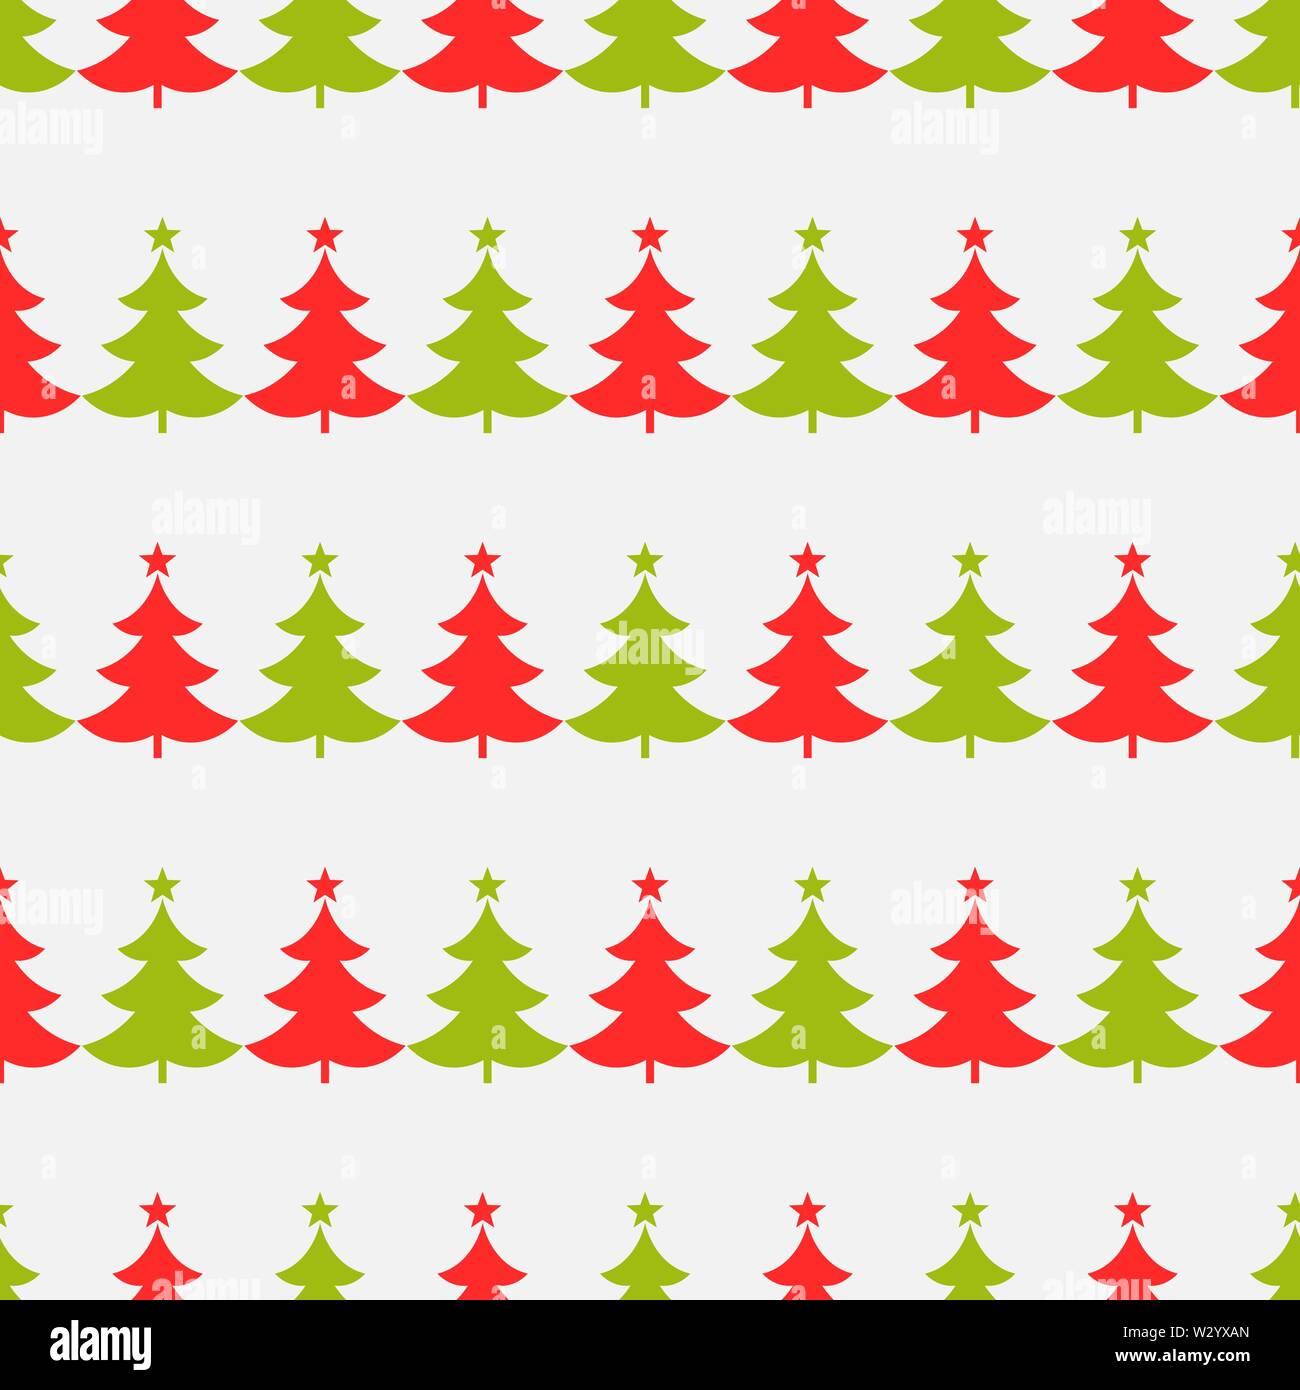 Christmas trees pattern. Vector illustration. - Stock Image